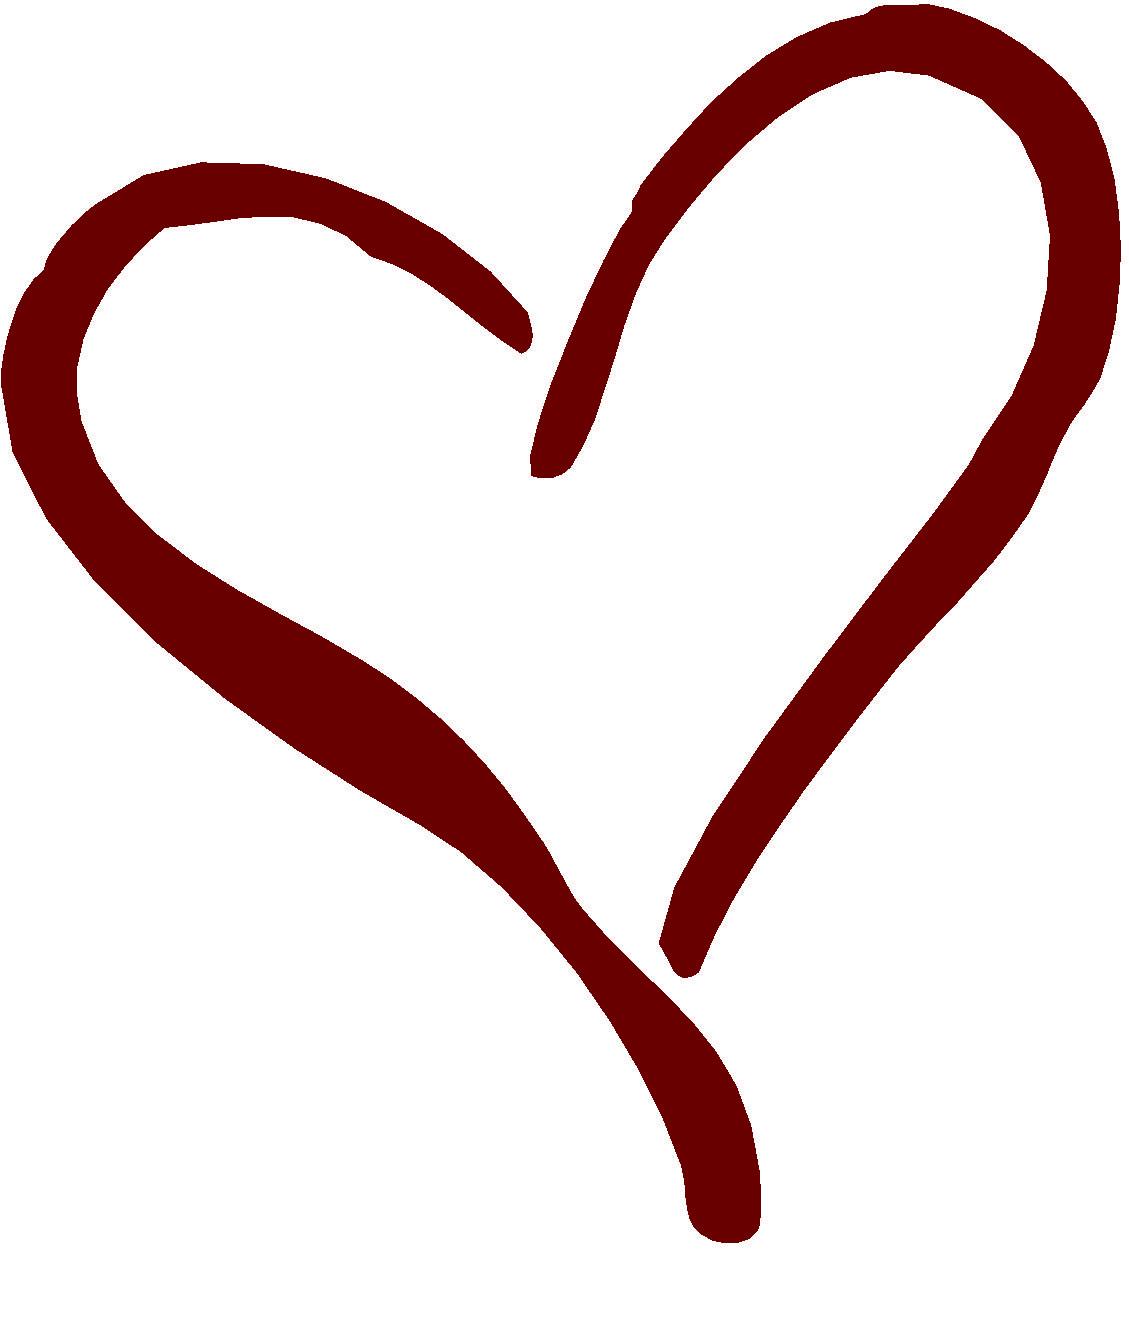 Fancy Heart Clip Art - ClipArt Best | GINGERS HEART ...